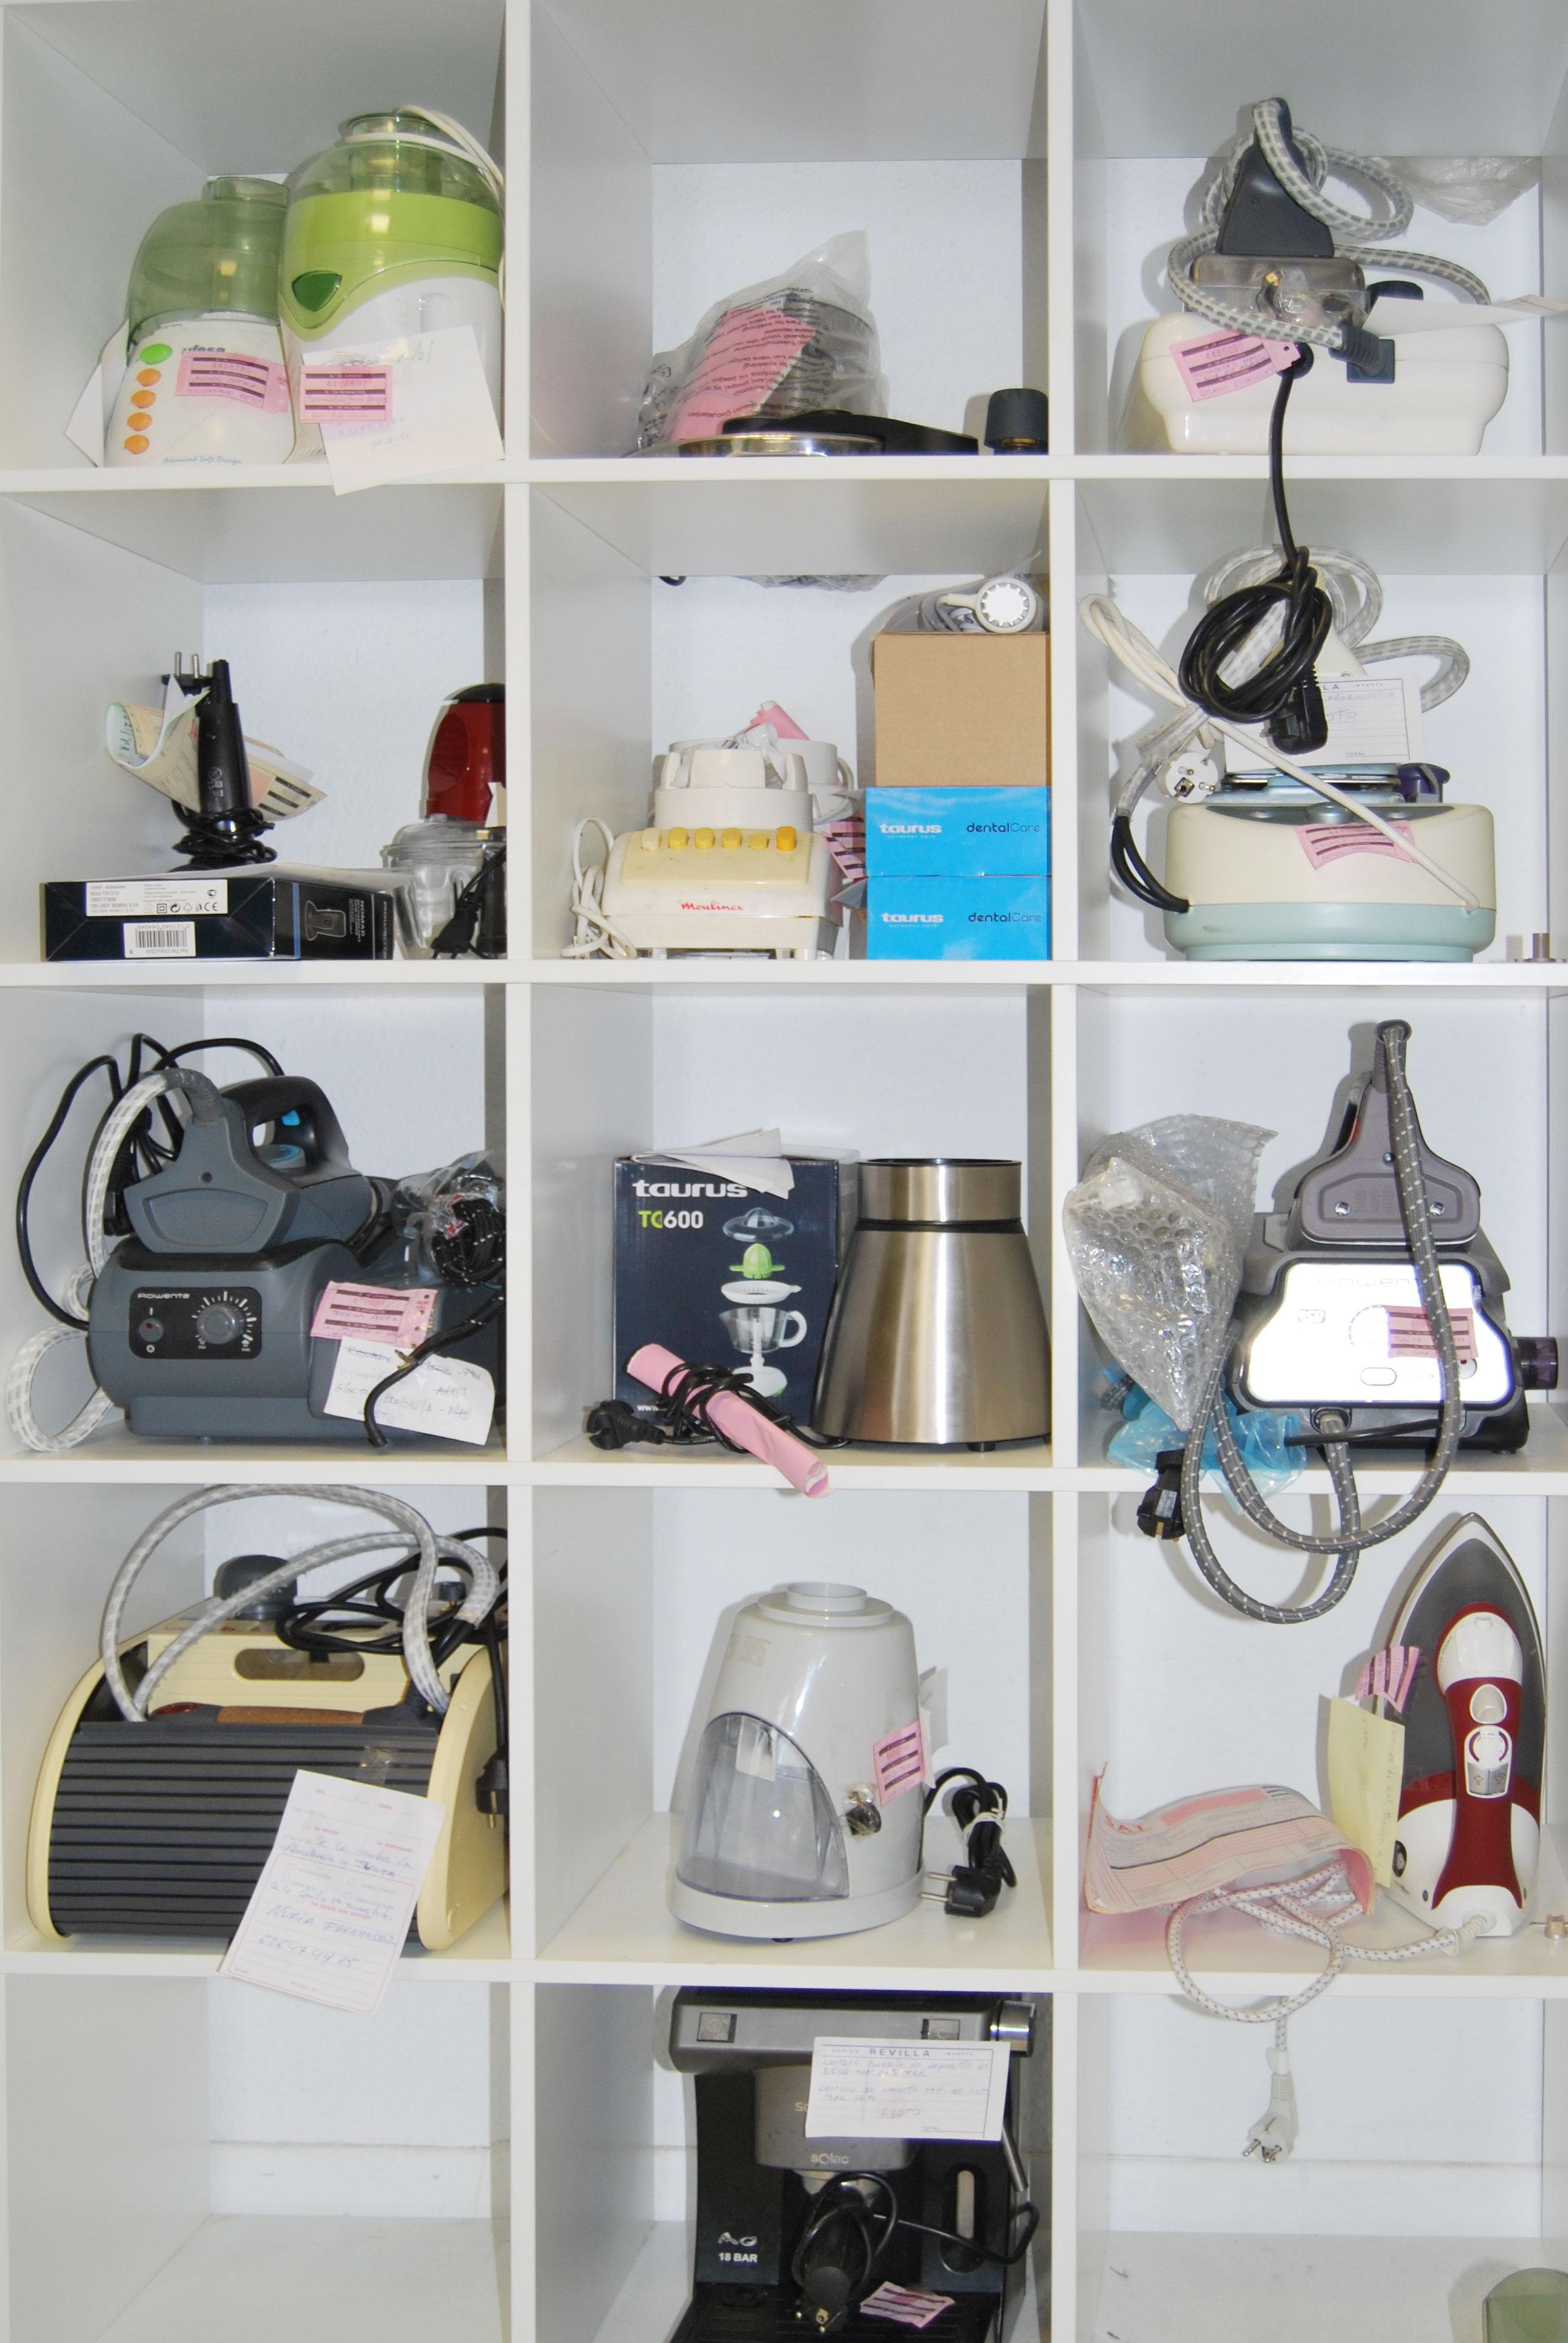 Asistencia Técnica Oficial Pequeños Electrodomésticos